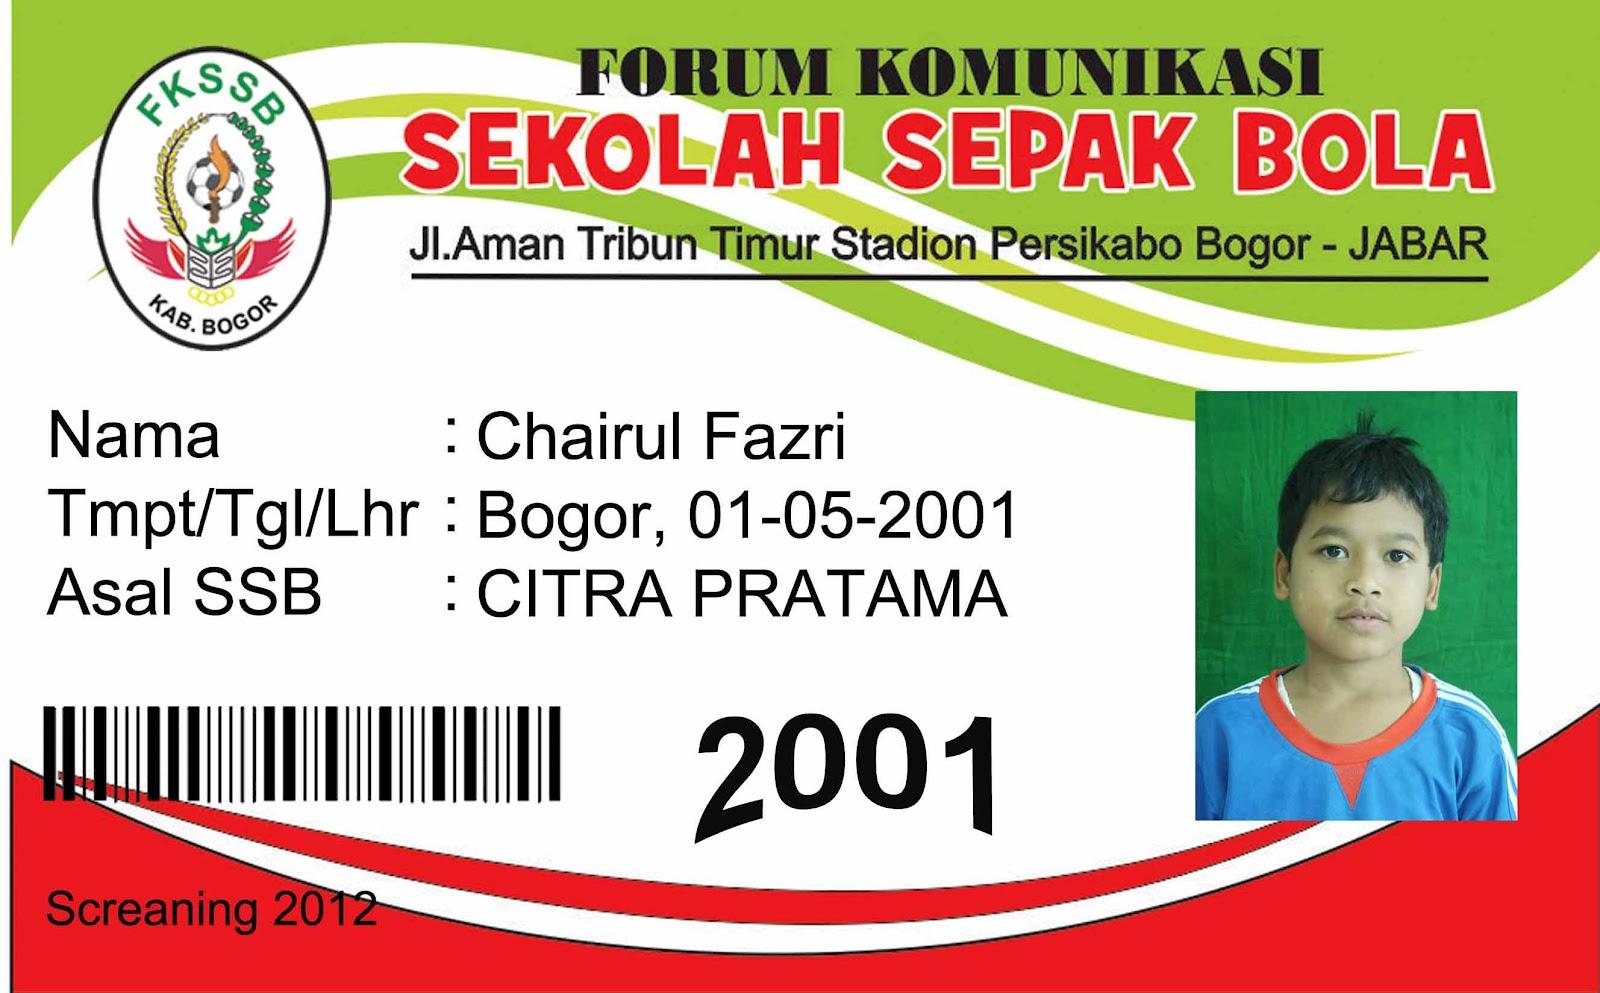 Contoh Id Card Pemain Fkssb Fkssb Kab Bogor